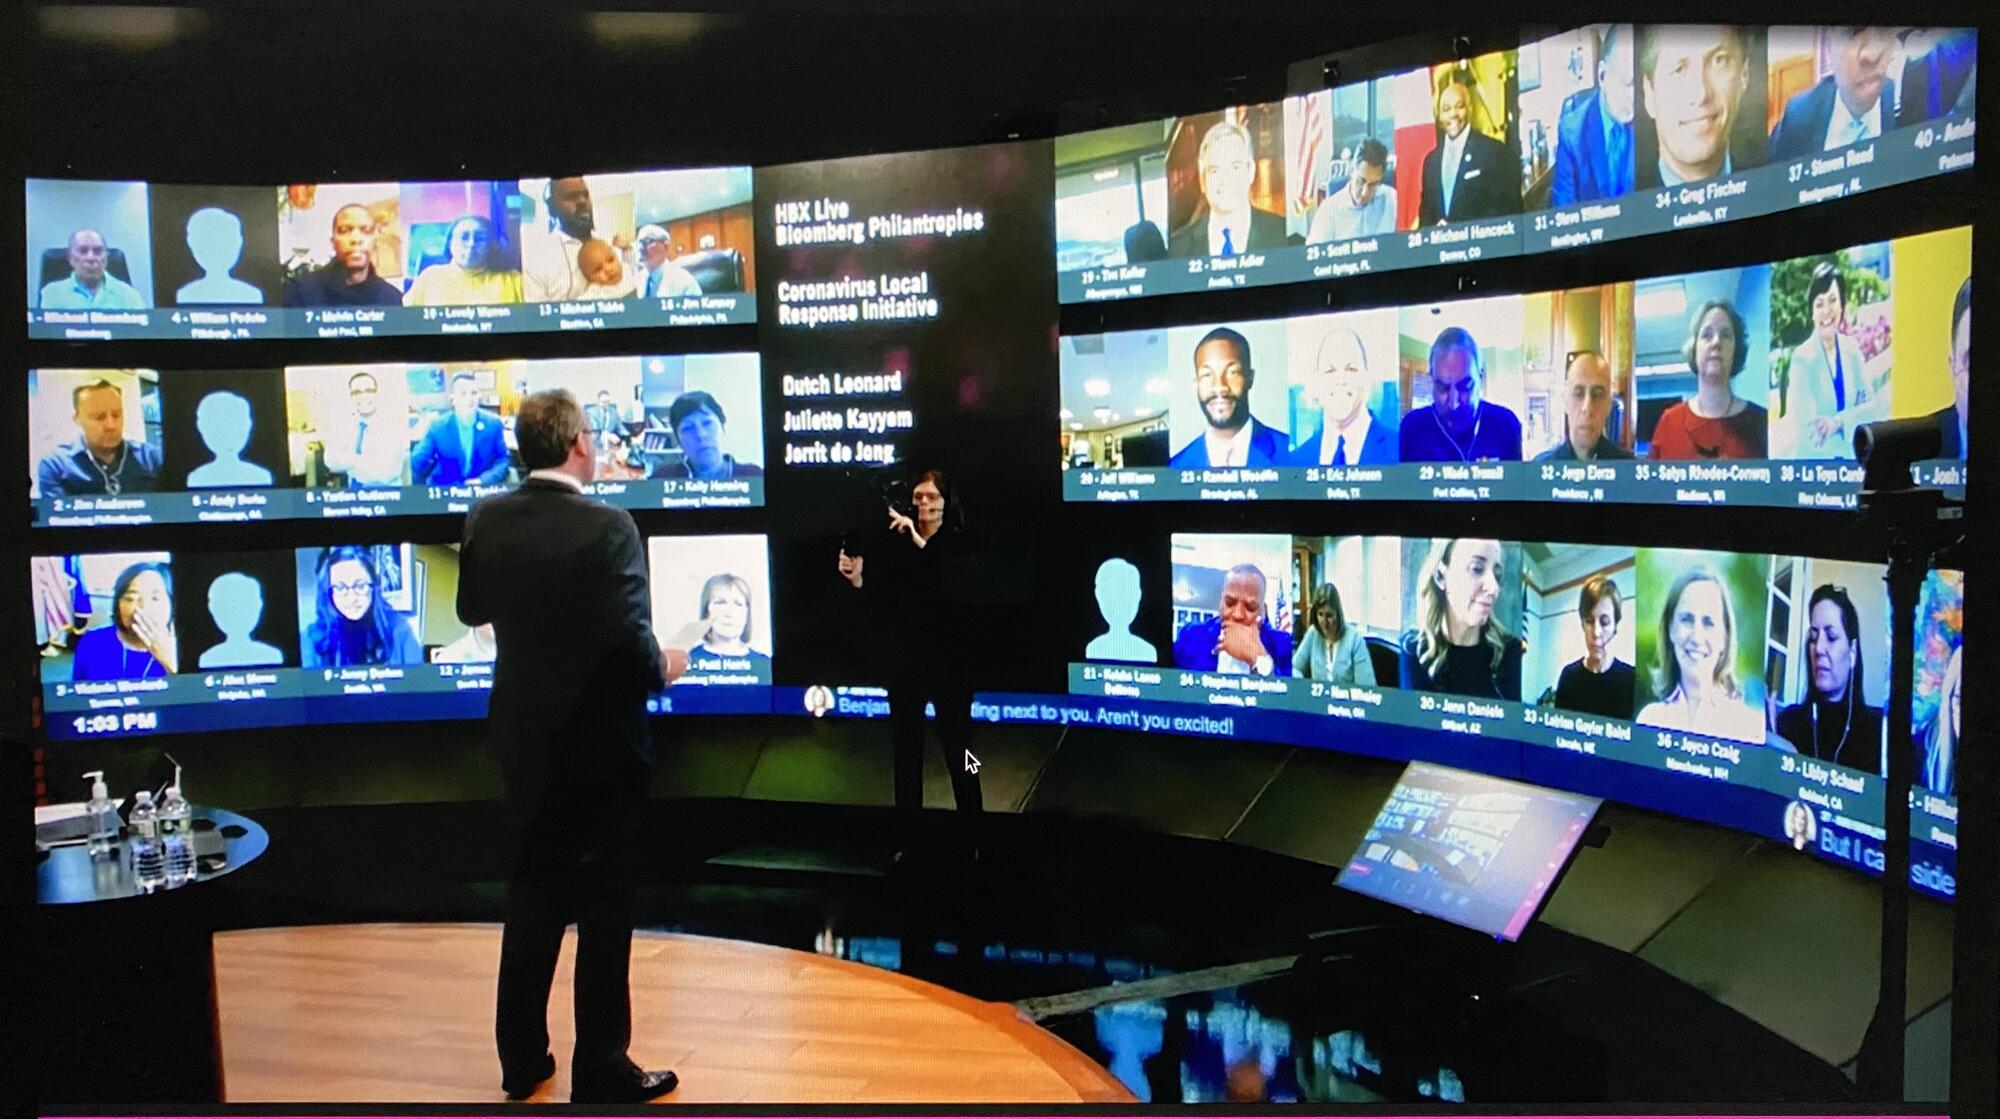 Jorrit de Jong teaching to city leader in a video conference